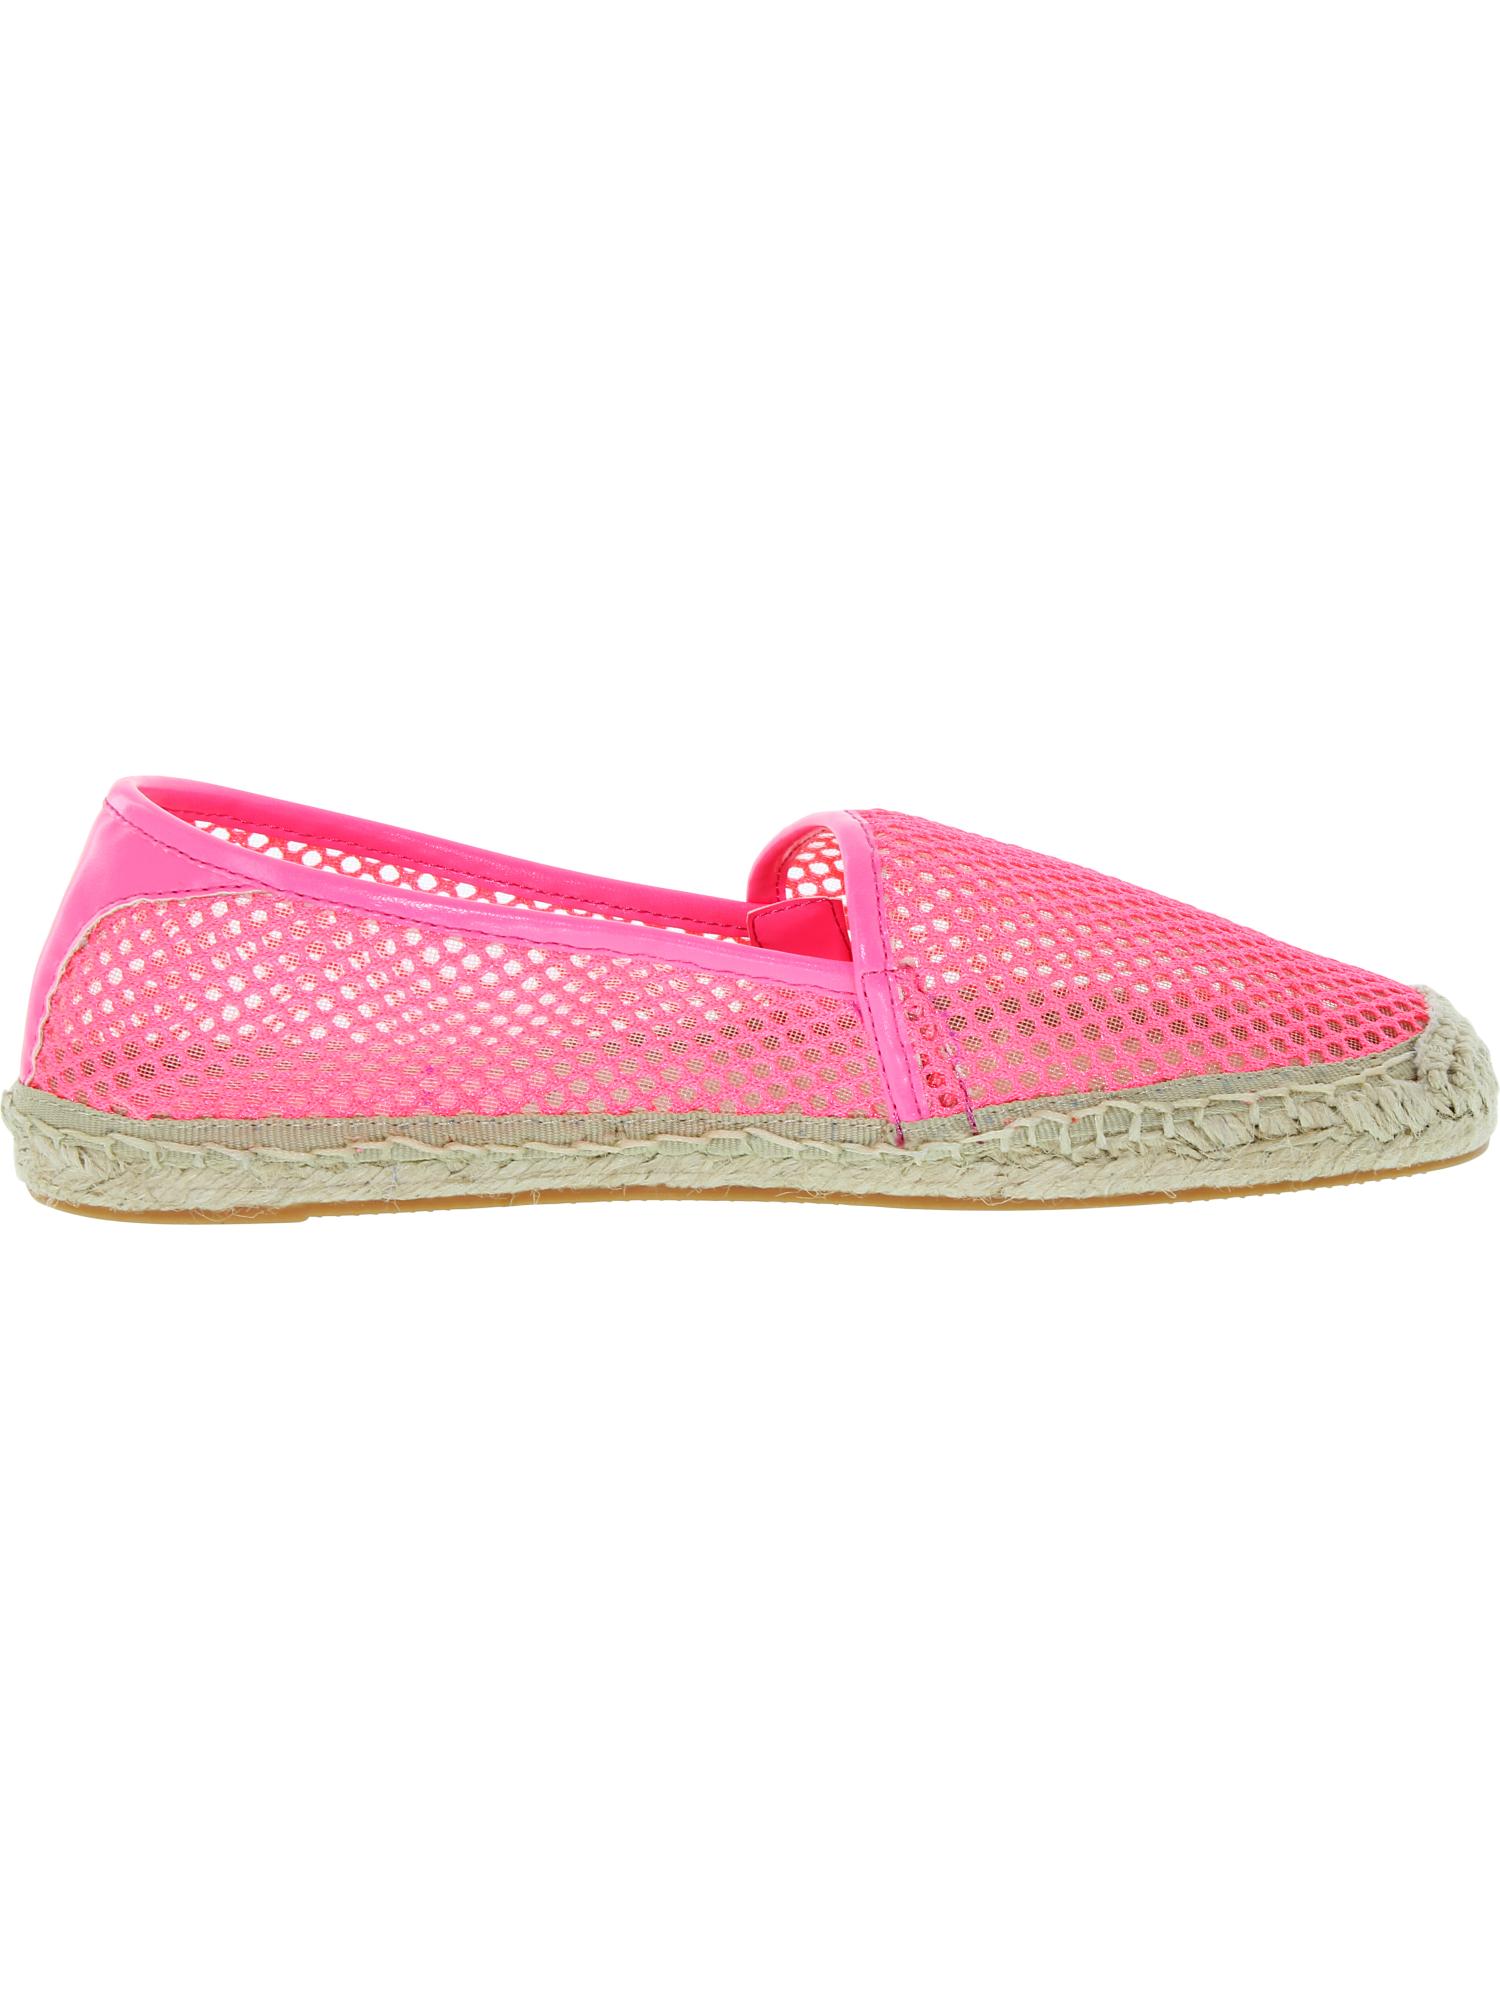 Rebecca-Minkoff-Women-039-s-Ginny-Ankle-High-Mesh-Slip-On-Shoes thumbnail 11